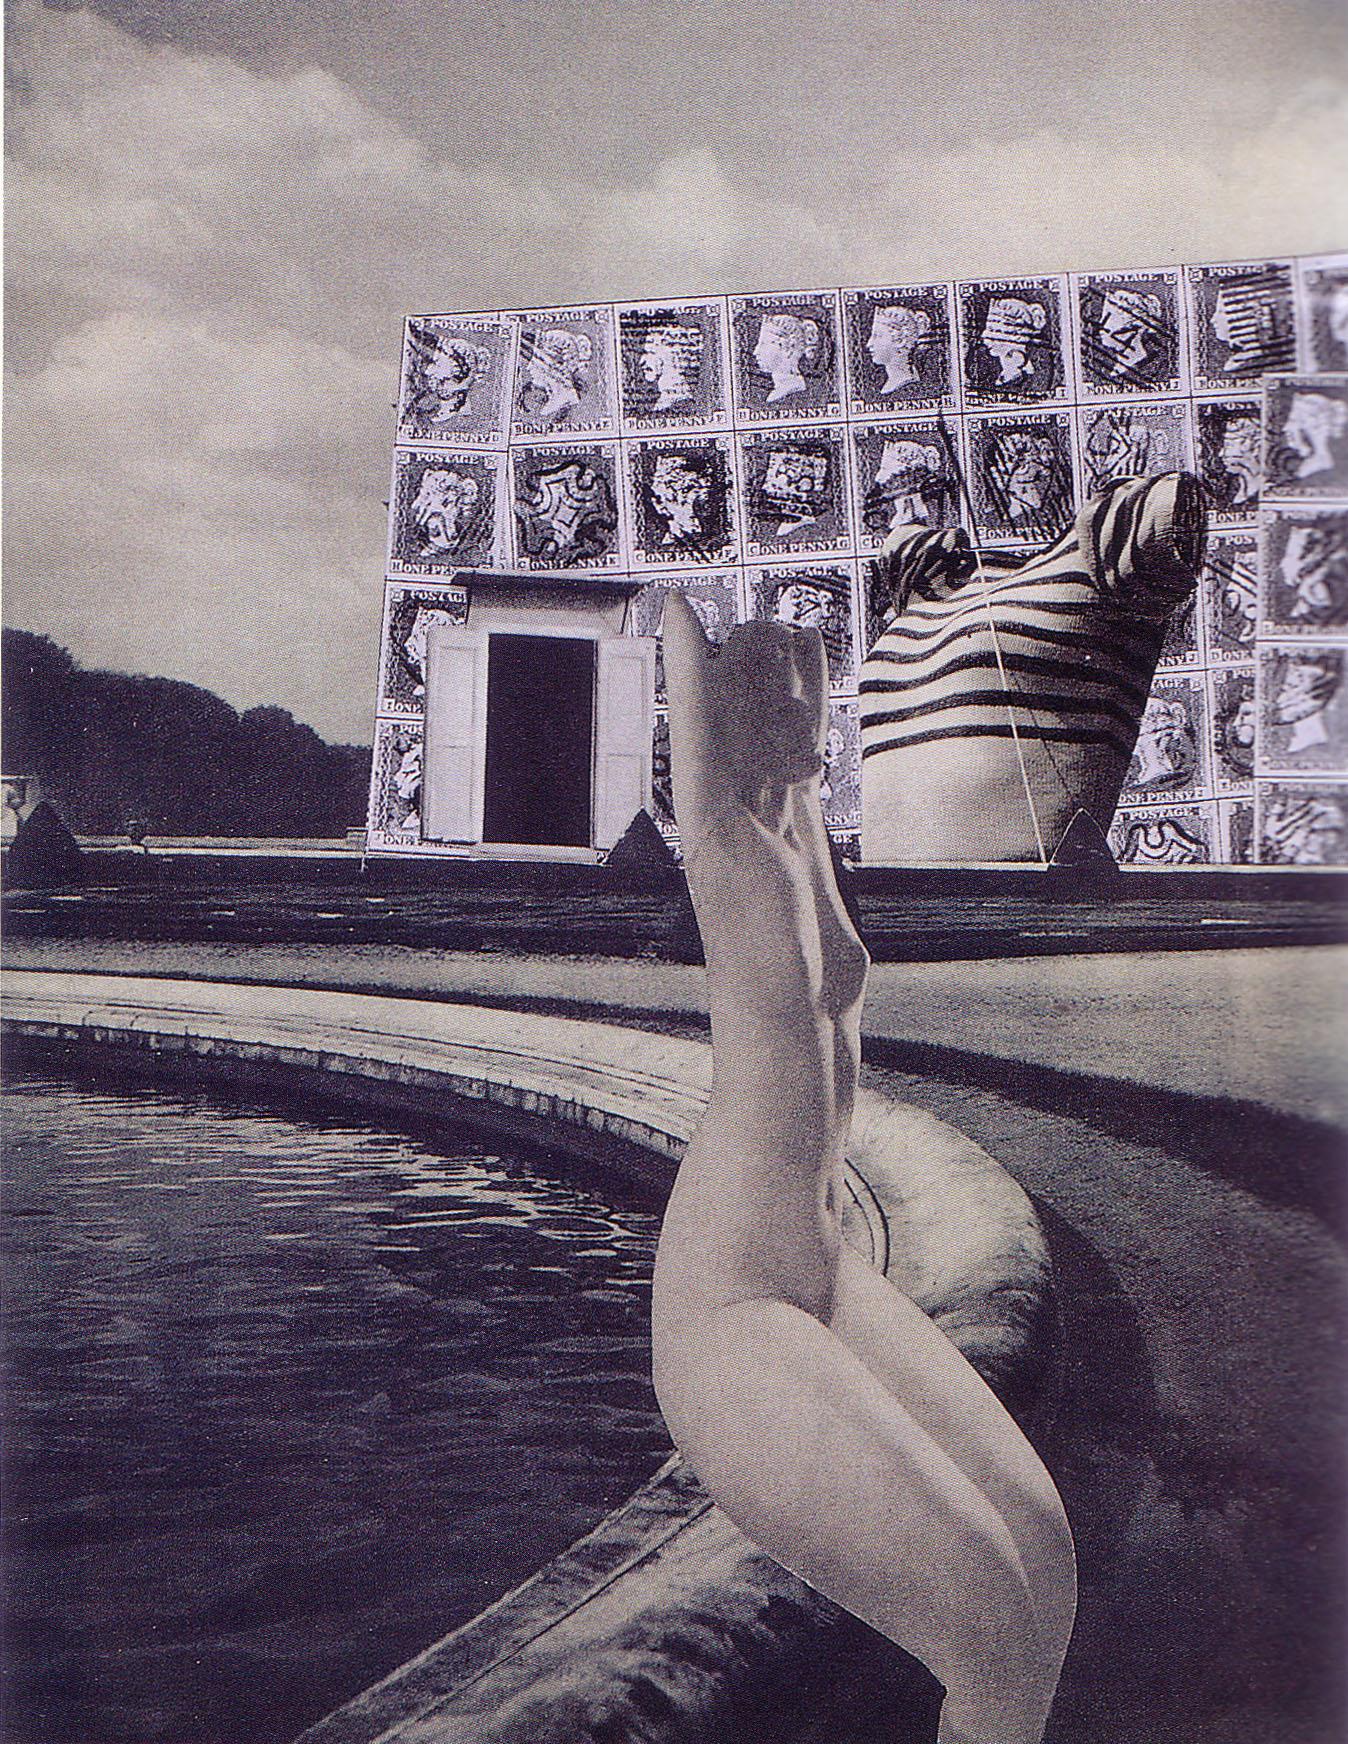 Karel Teige-Collage # 226, 1942 (c) Nachlass Karel Teige